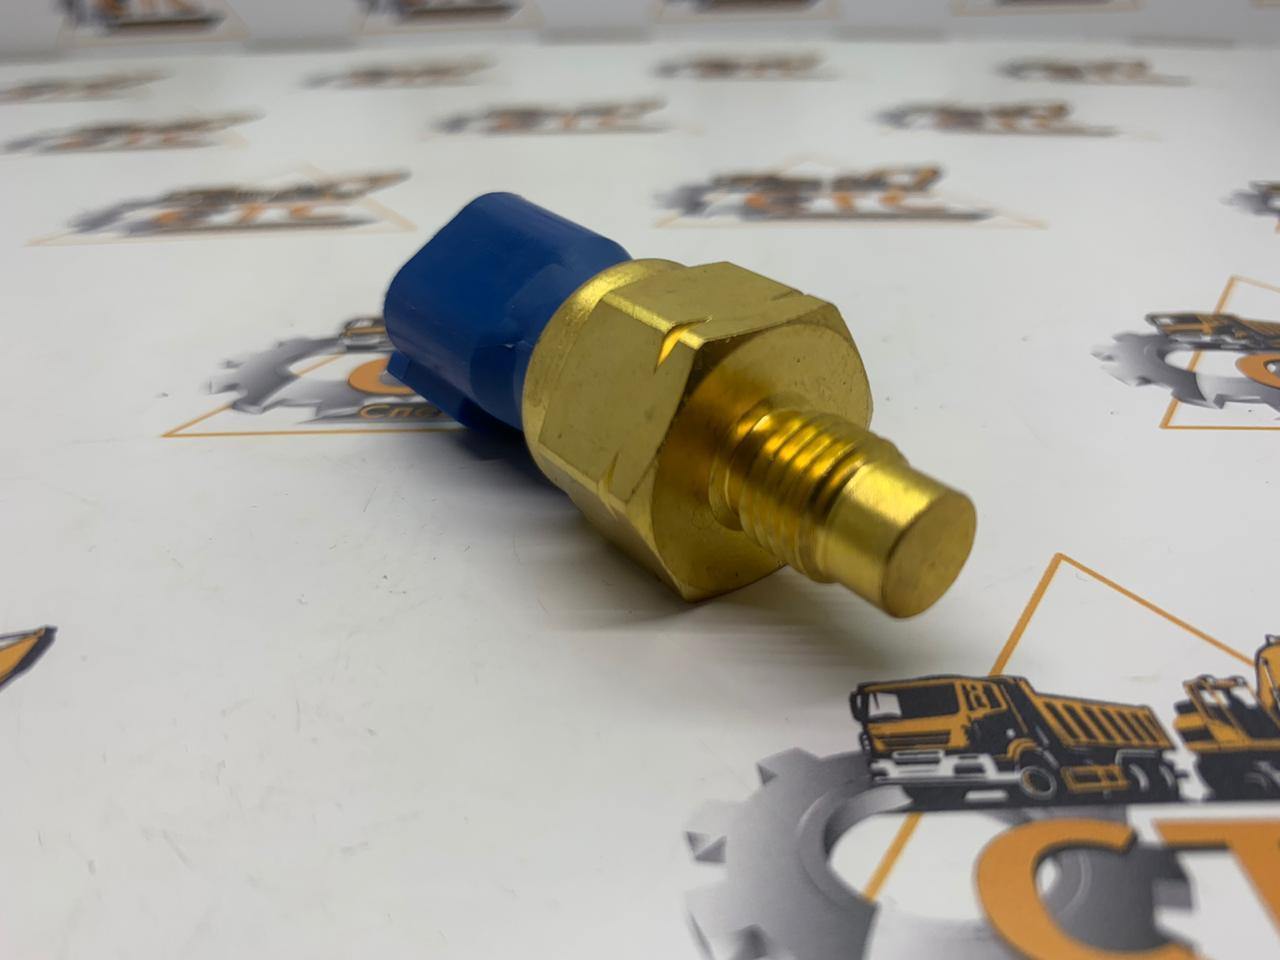 Датчик температуры двигателя на JCB 3CX, 4CX номер : 320/04588, 320/A4901